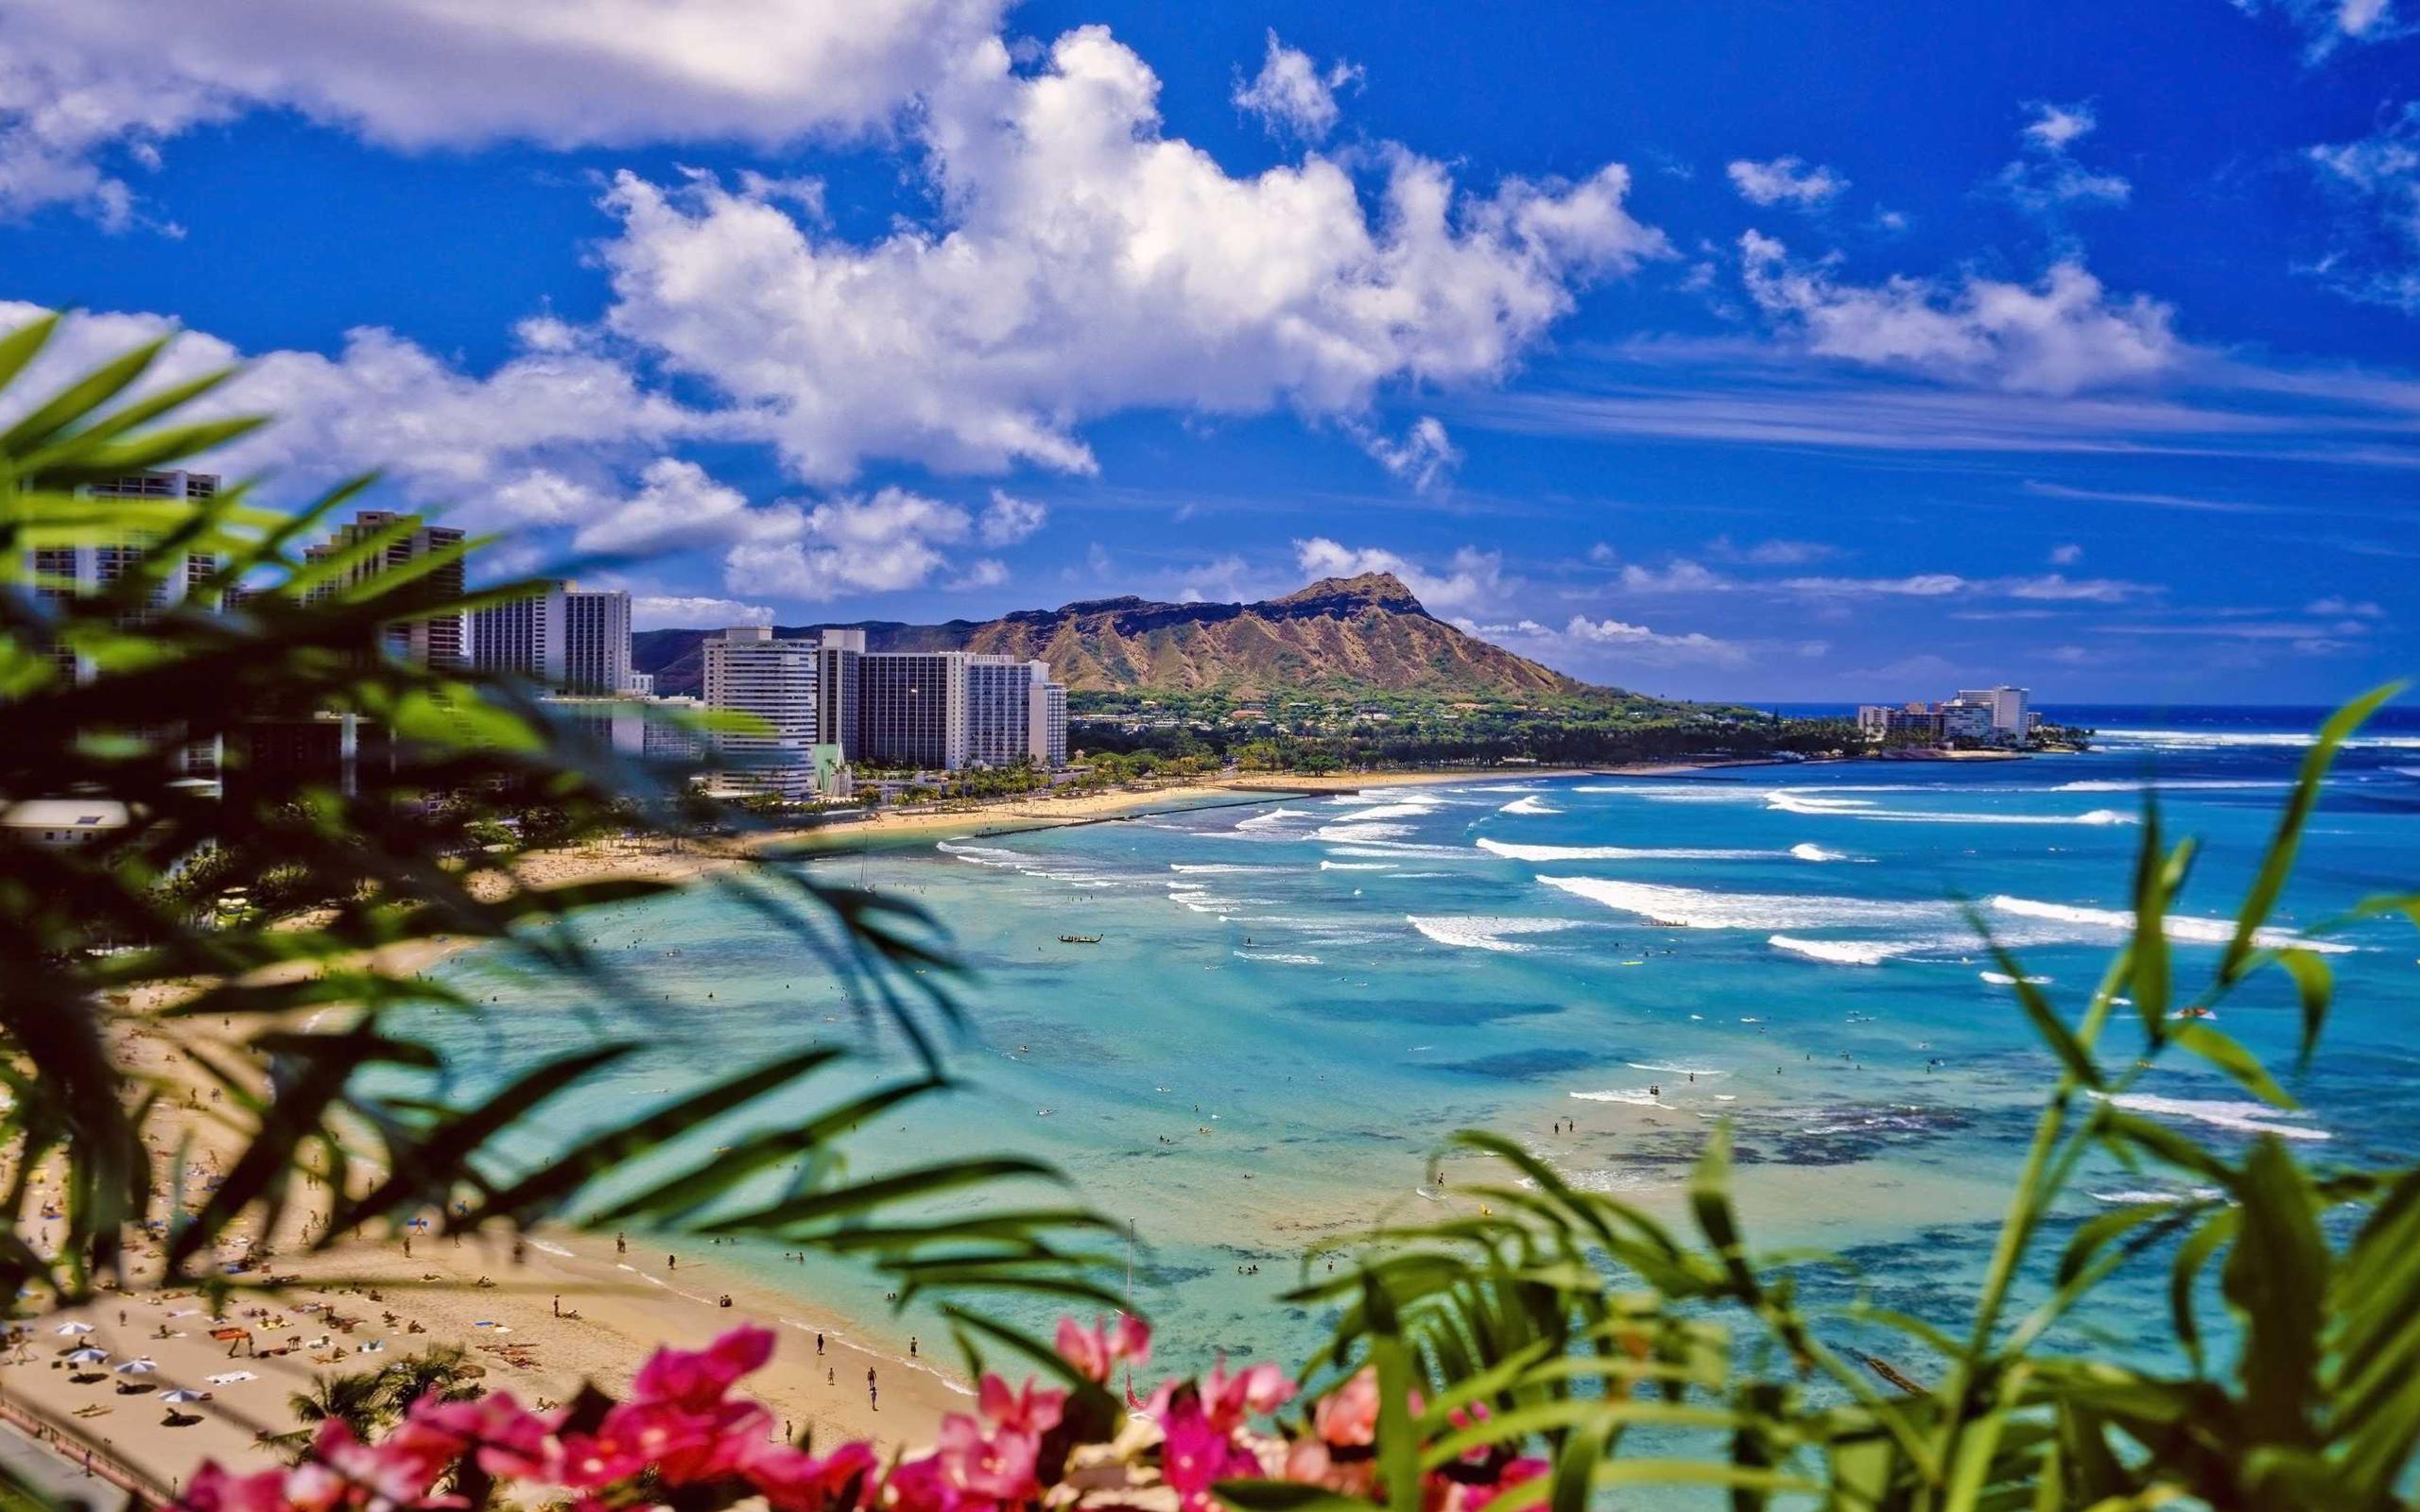 Waikiki Beach Oahu Desktop Wallpaper Hd 2560x1600 Wallpapers13com 2560x1600